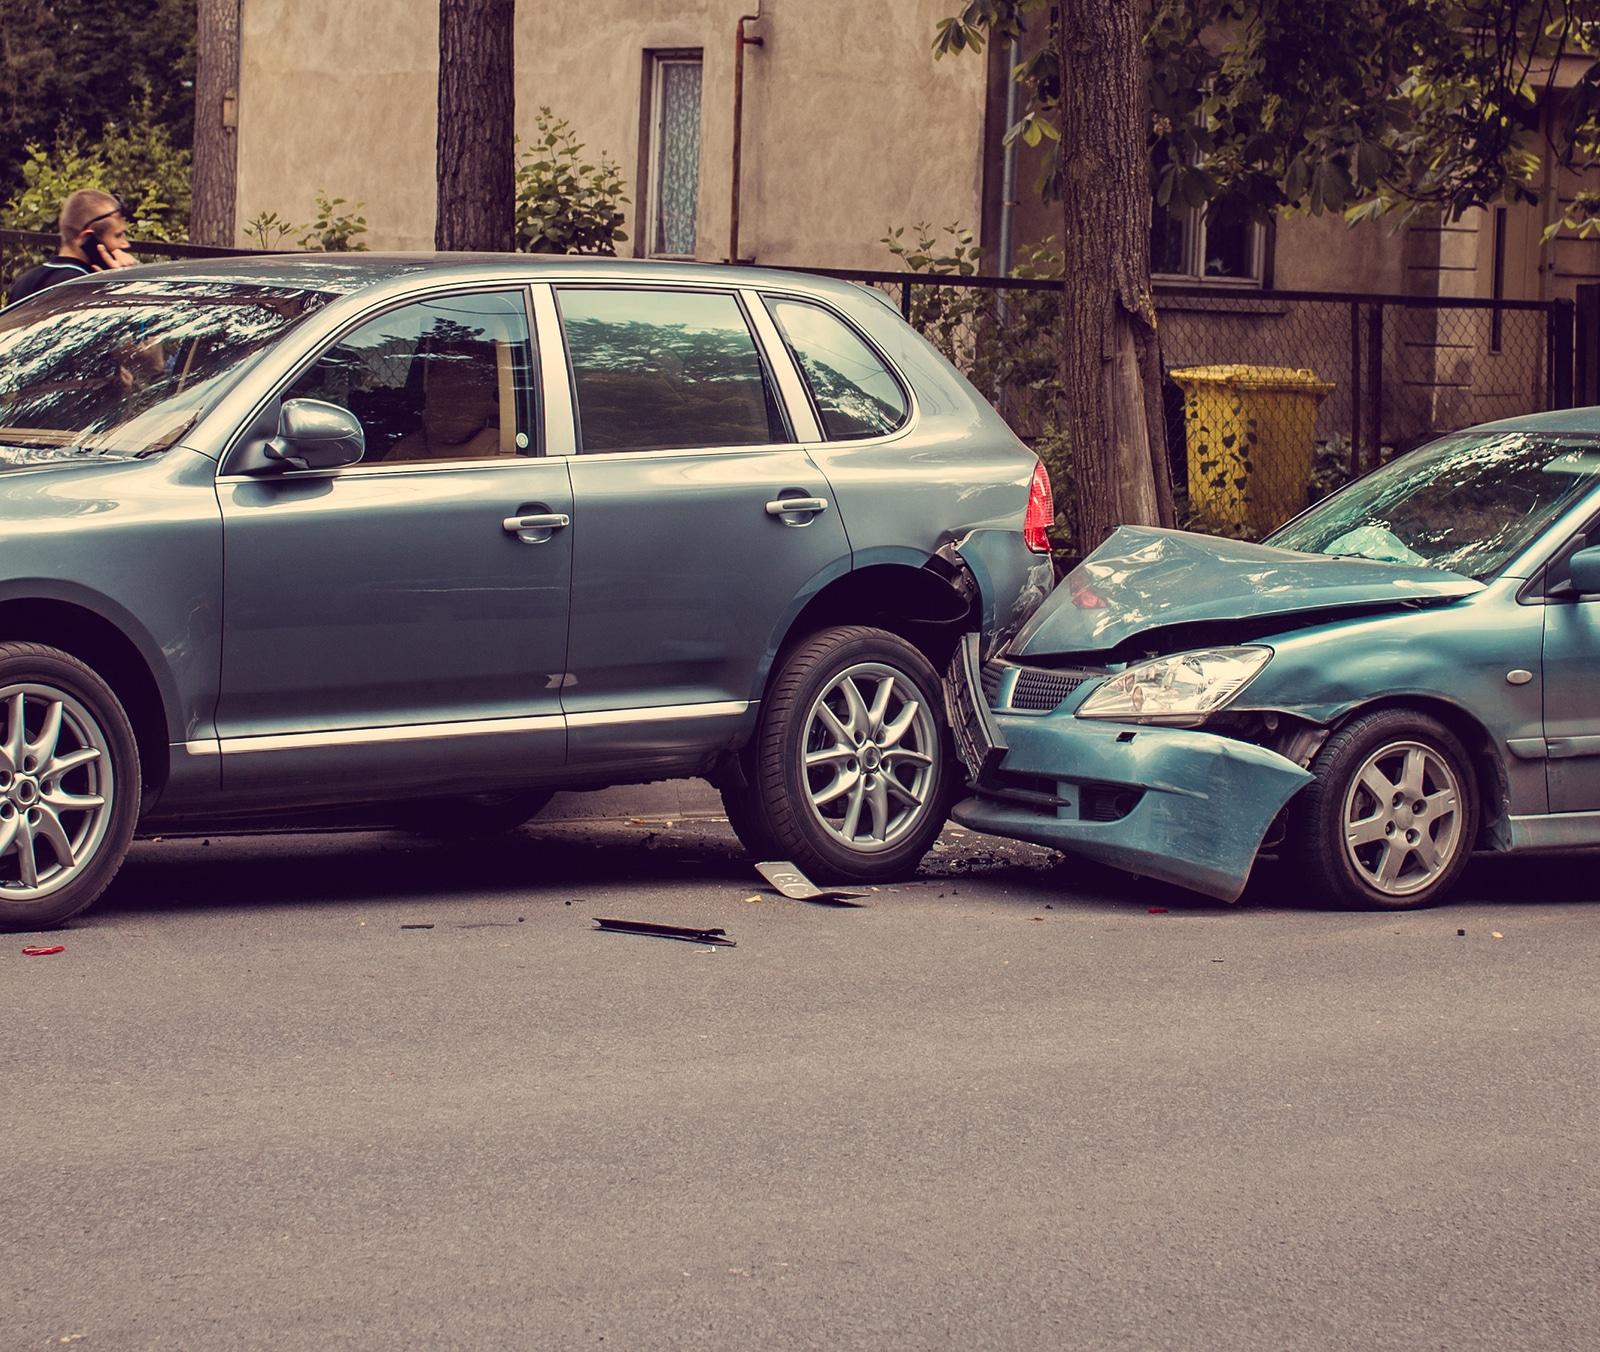 cars crashing